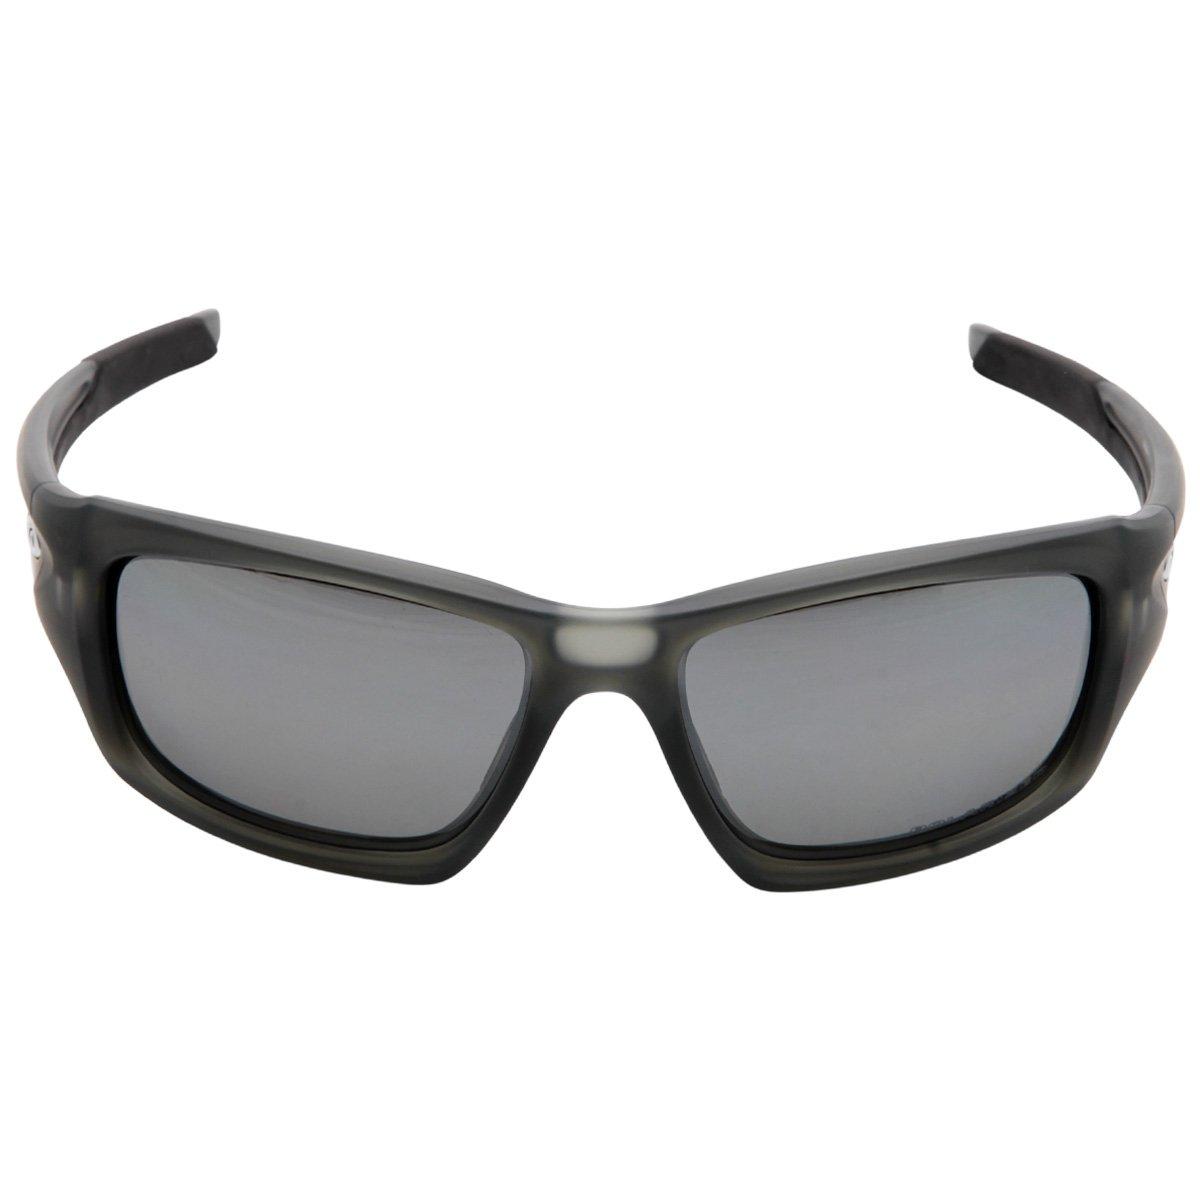 03f541b5e0692 Óculos de Sol Oakley Valve Iridium - Compre Agora   Netshoes